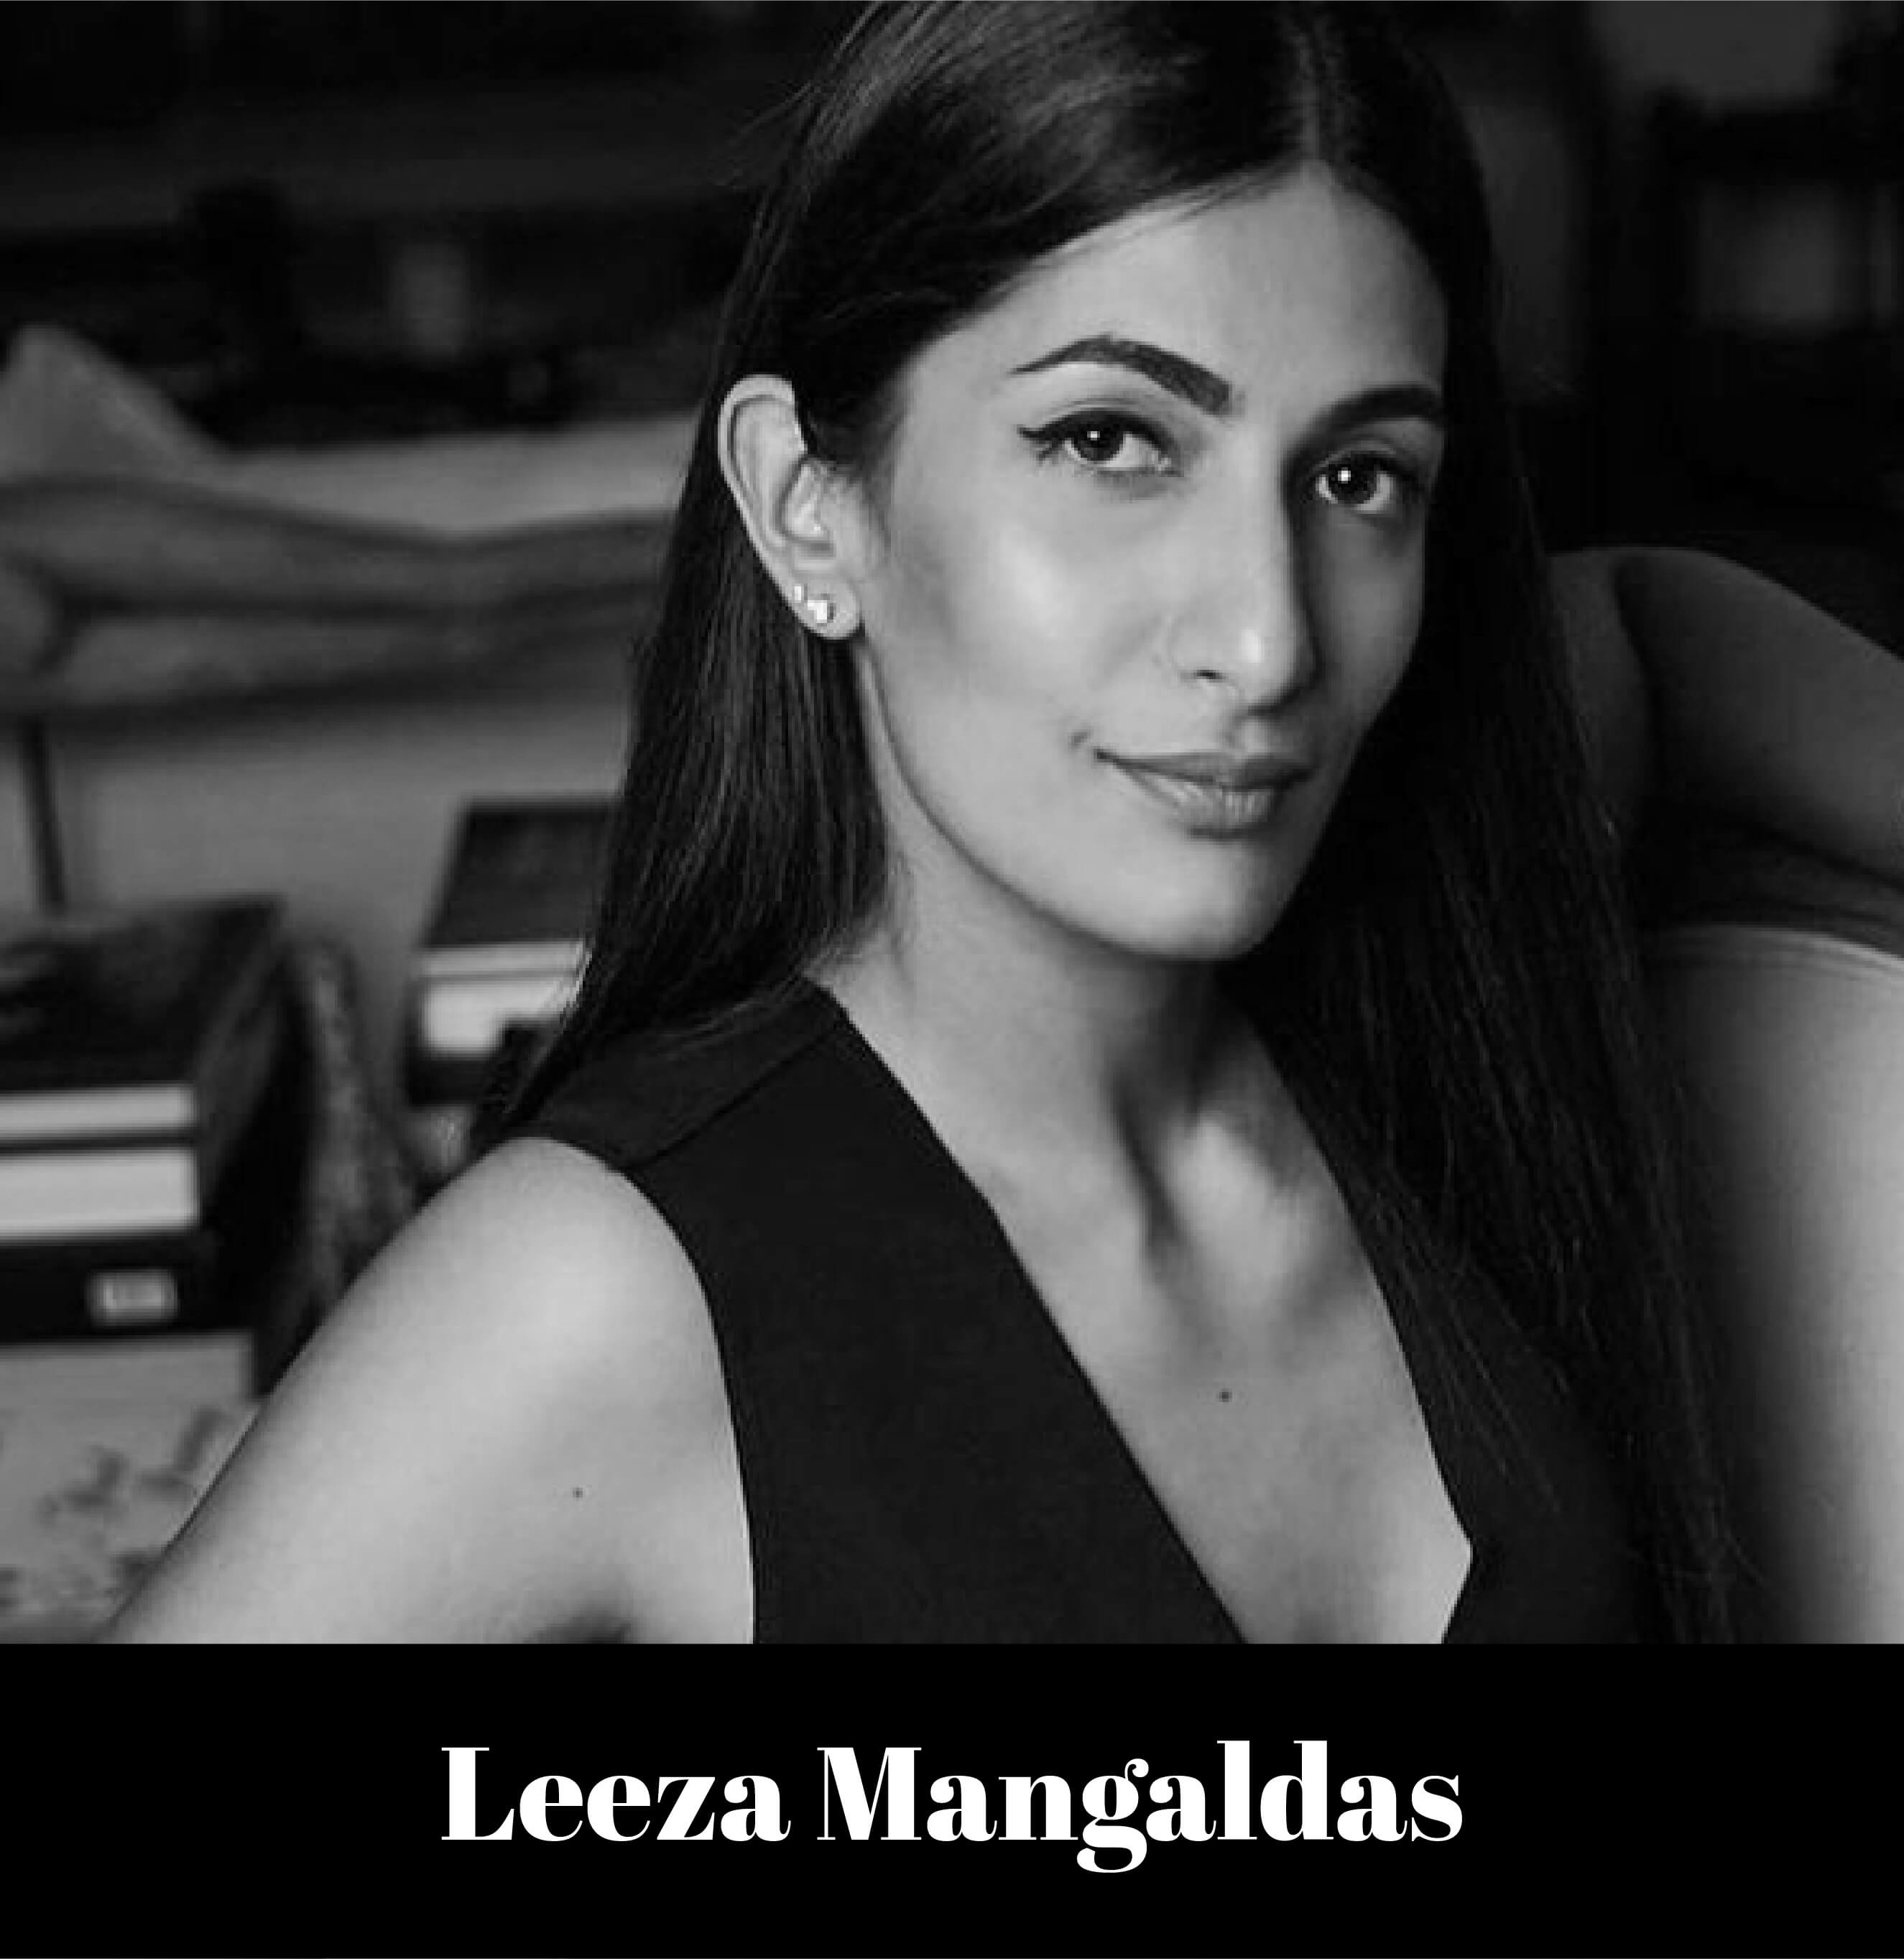 Leeza-Mangaldas_2.jpg